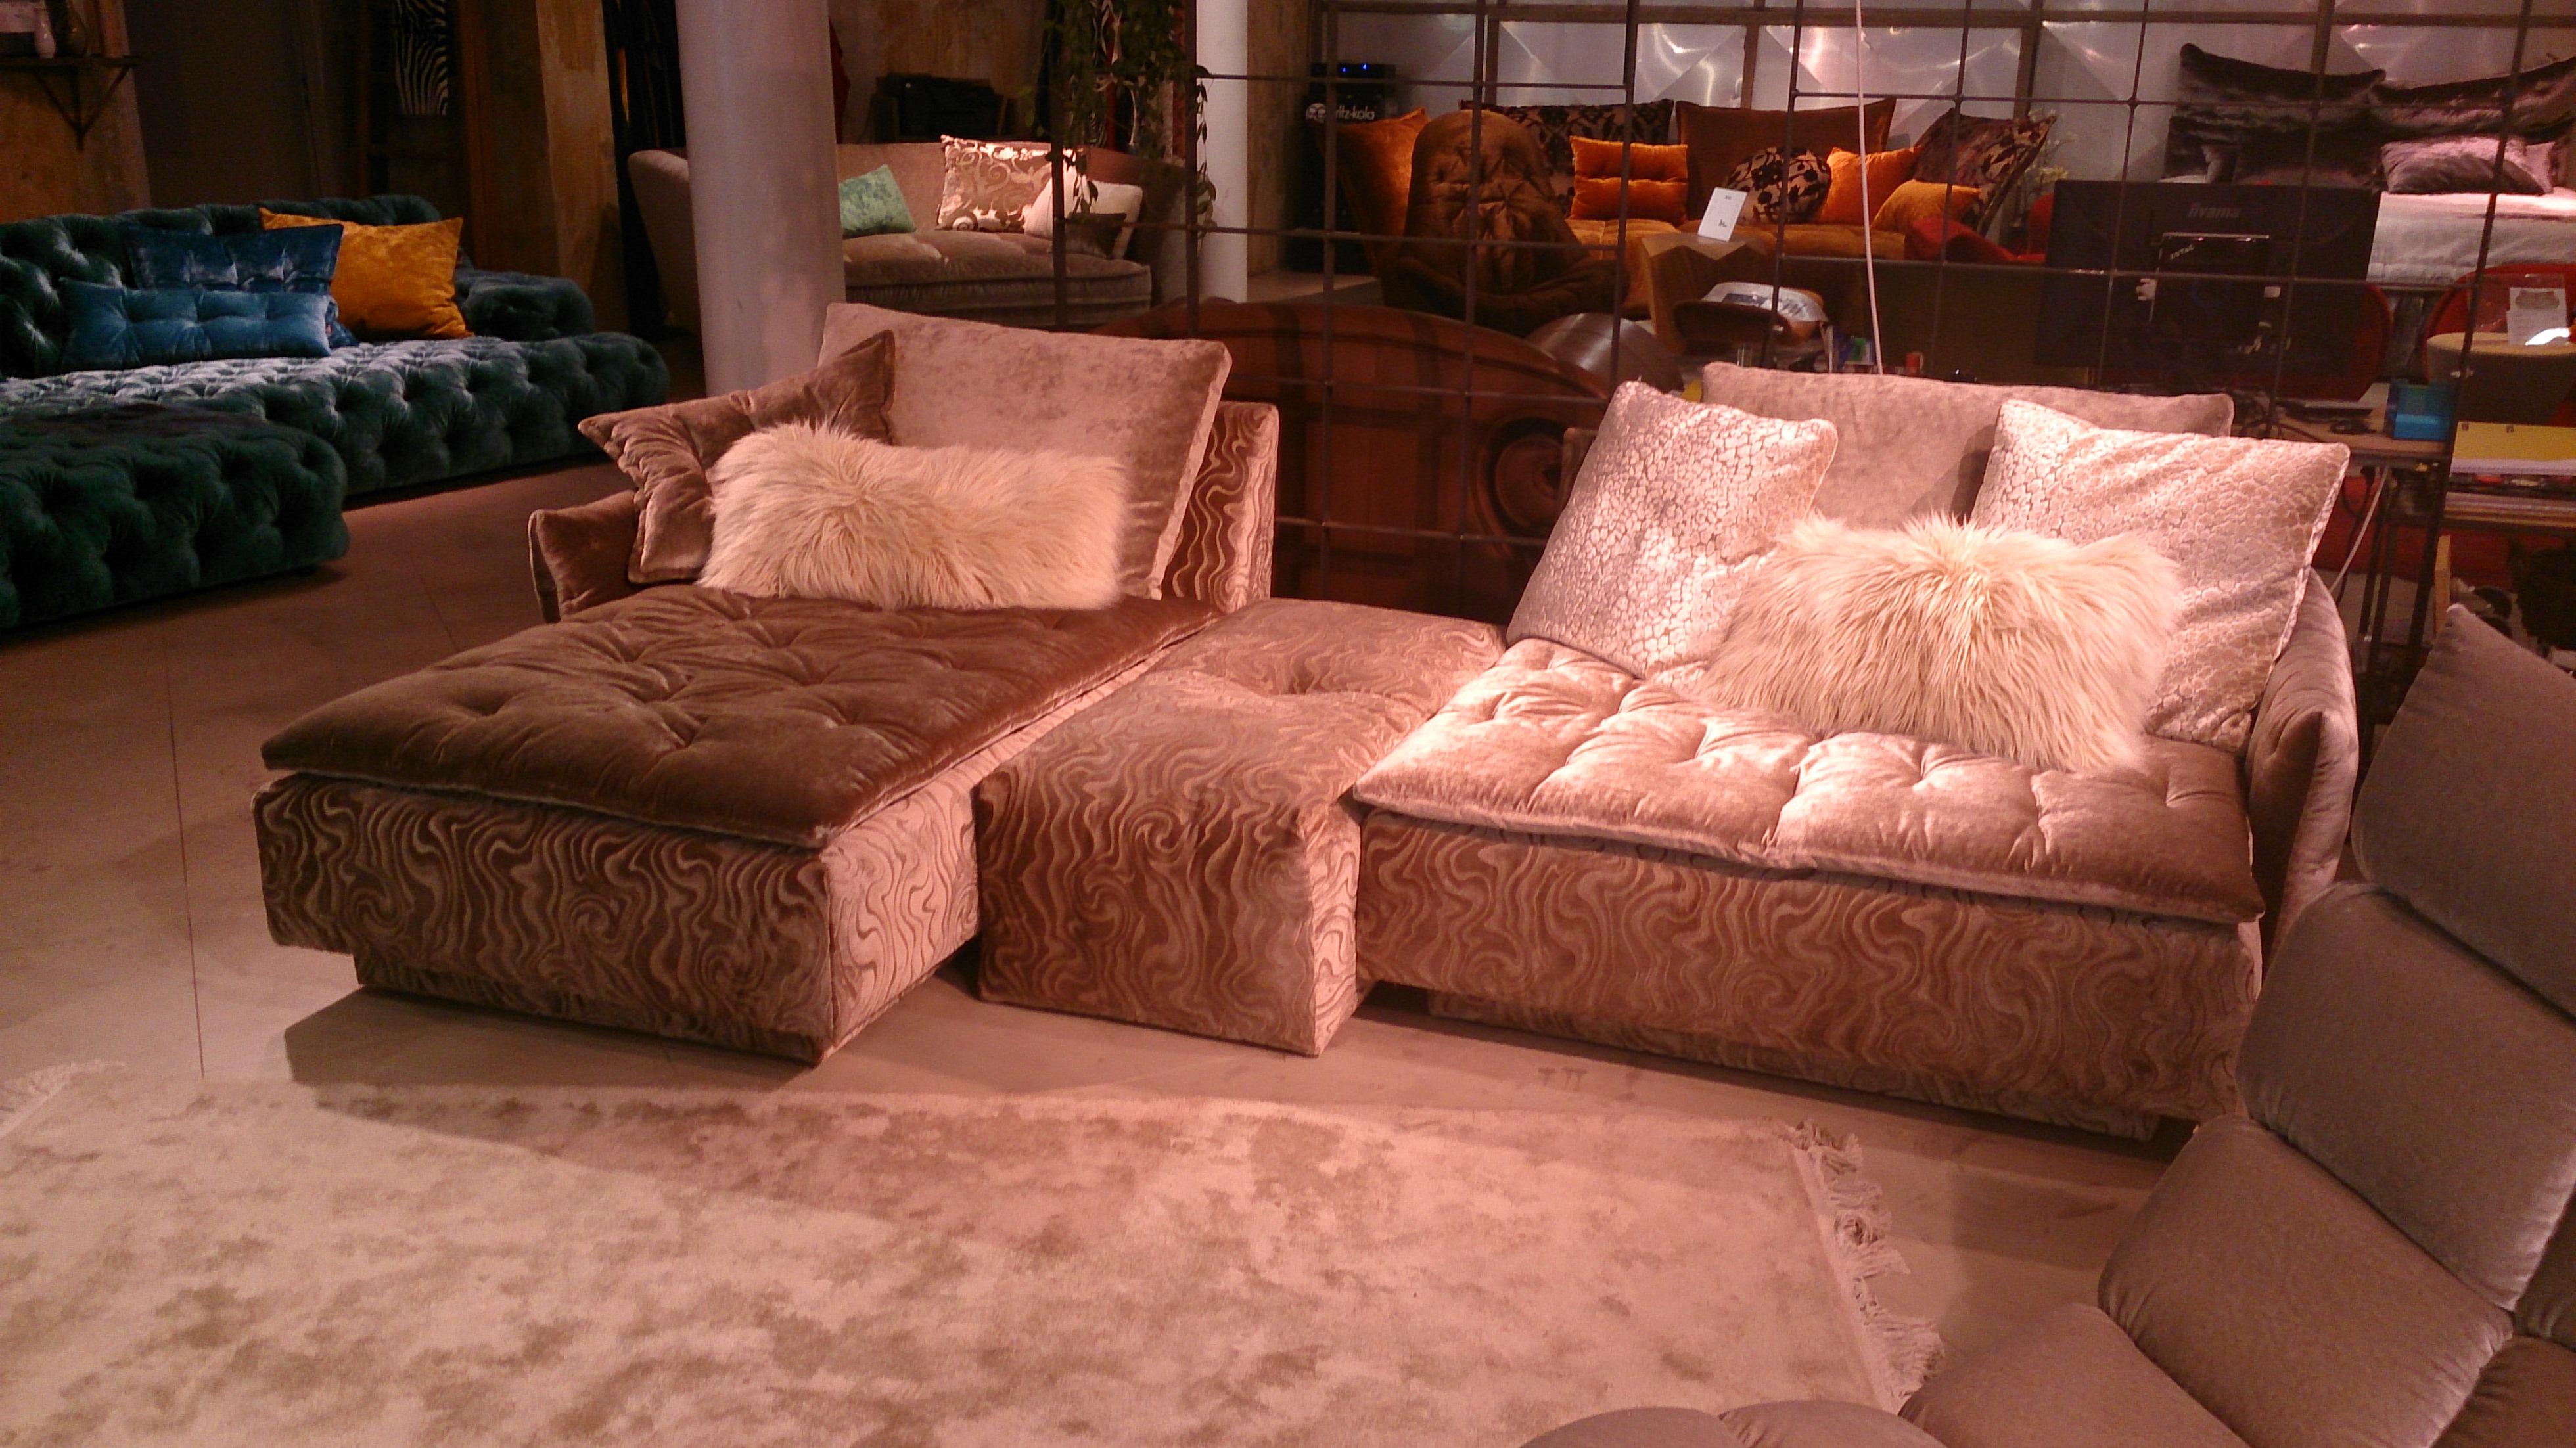 dsc 2372 bretz store frankfurt. Black Bedroom Furniture Sets. Home Design Ideas